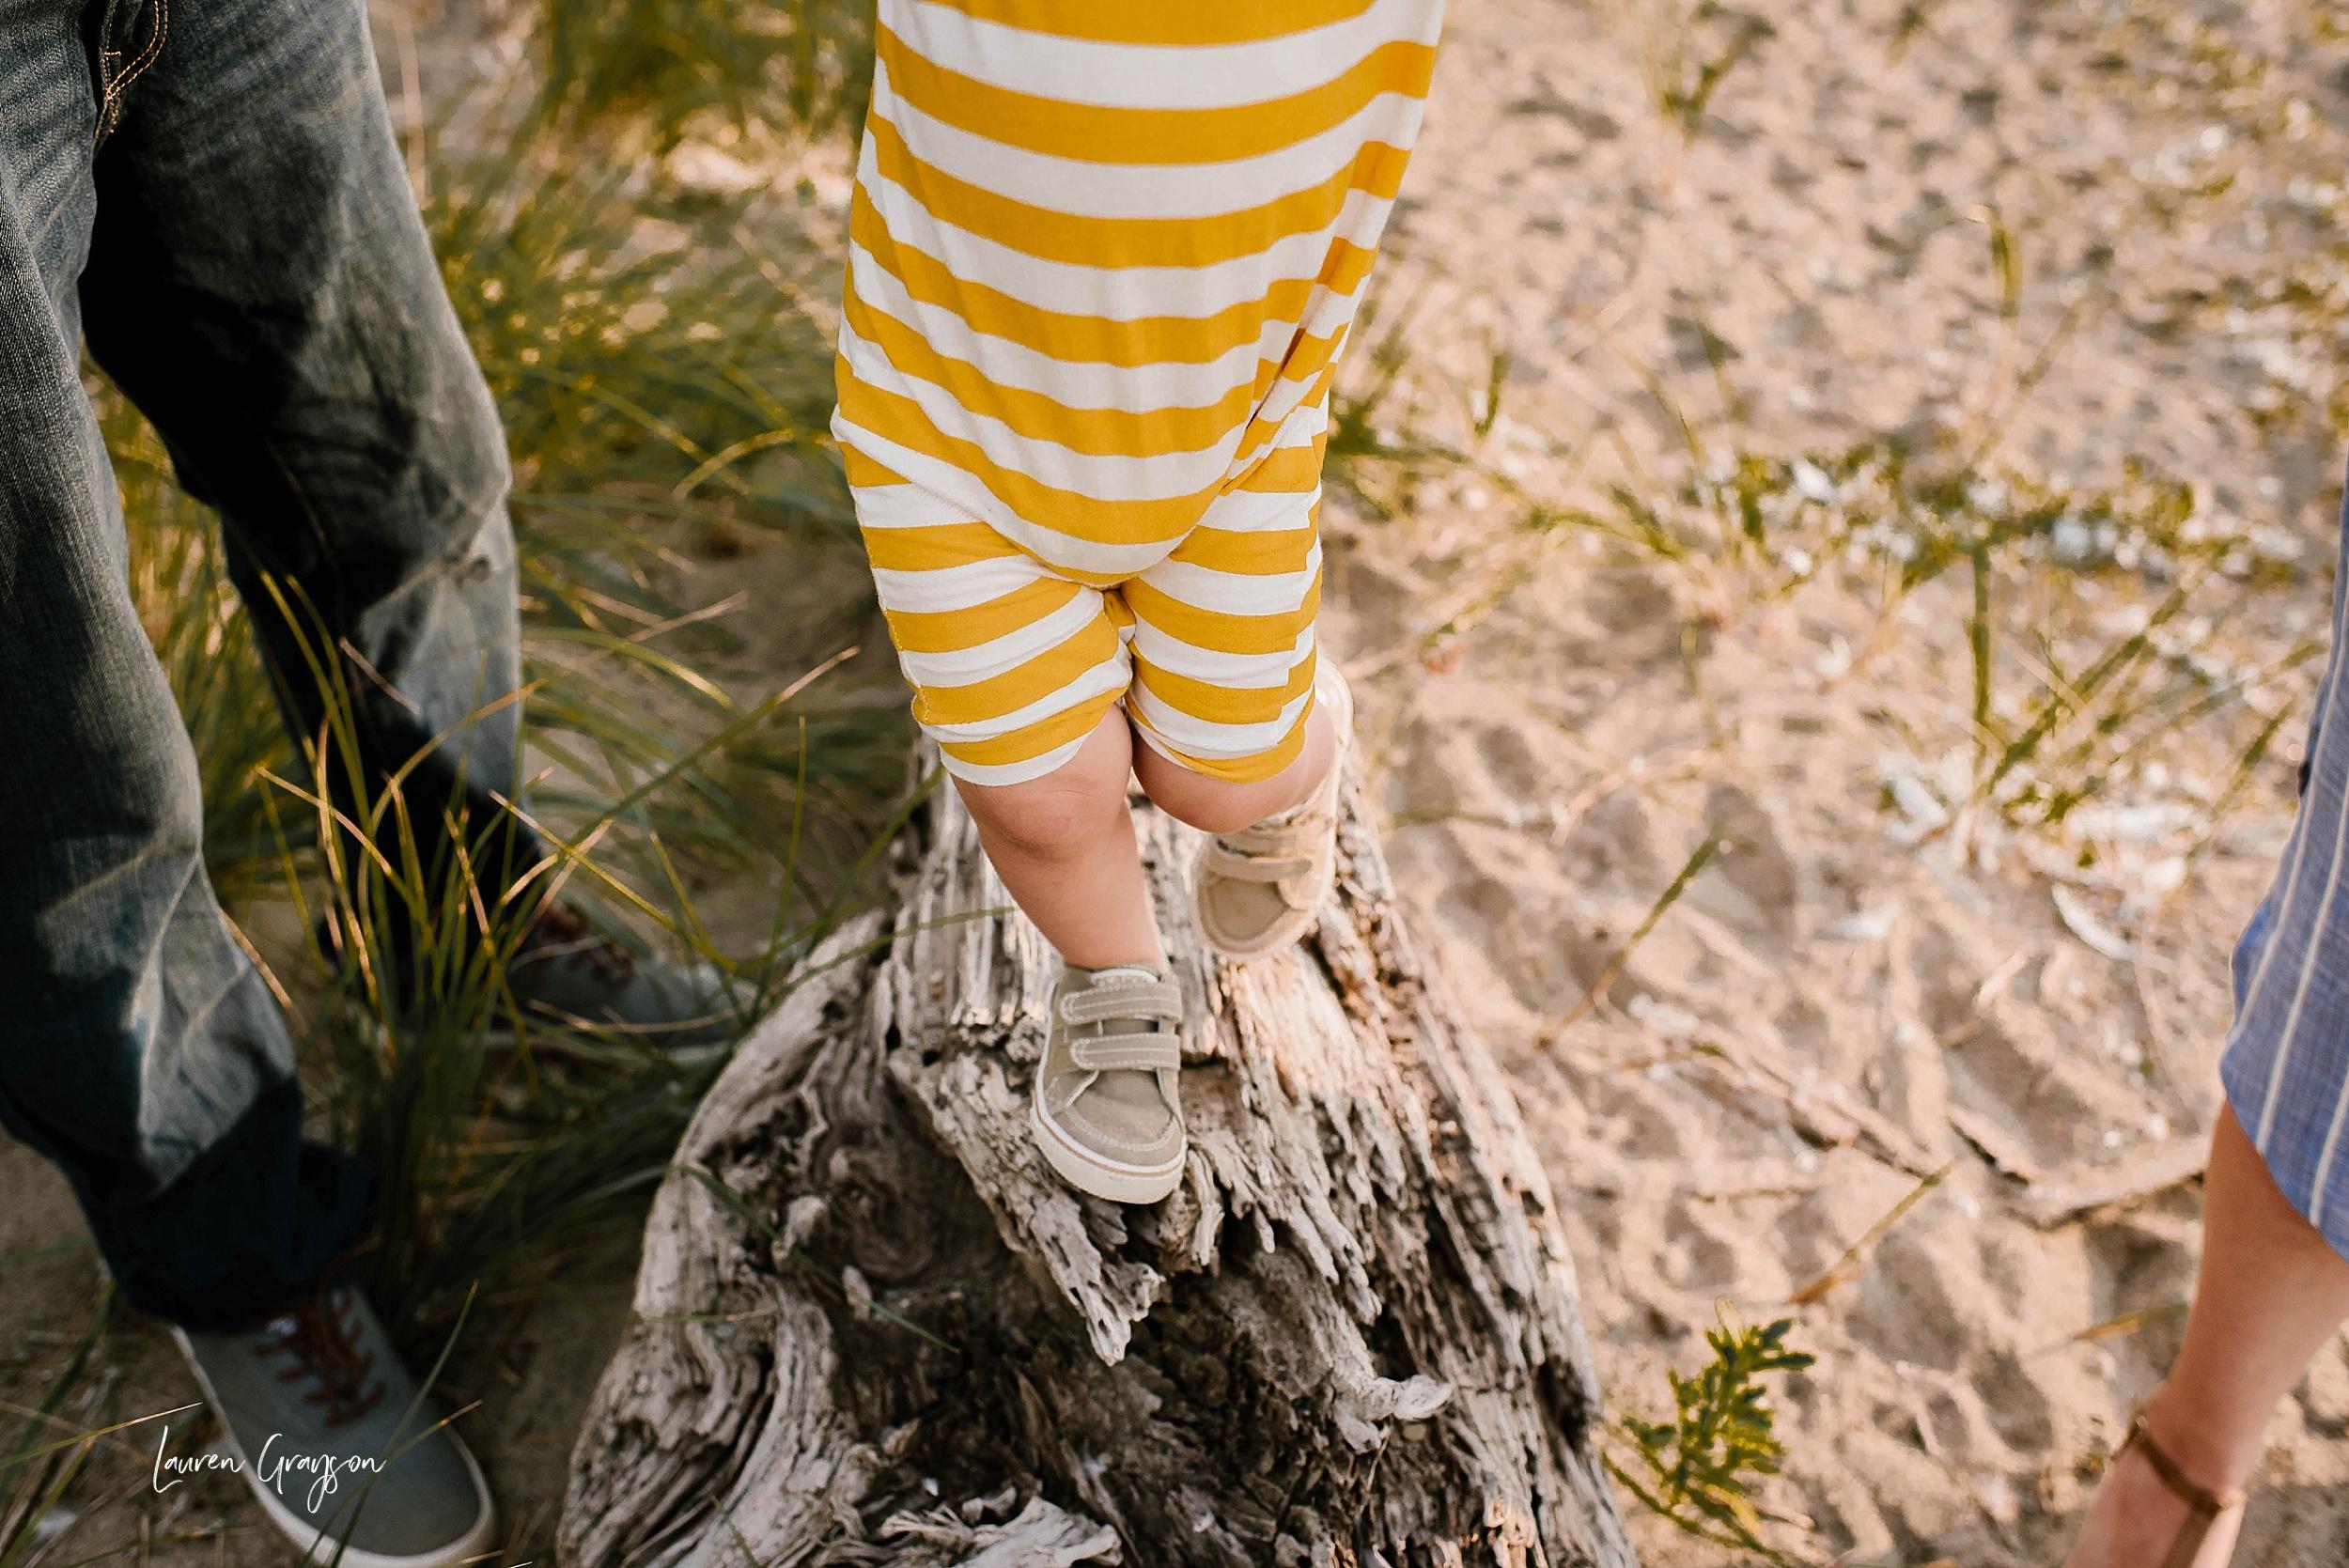 lauren-grayson-photography-cleveland-ohio-photographer-mentor-headlands-beach-maternity-session-2018_0759.jpg